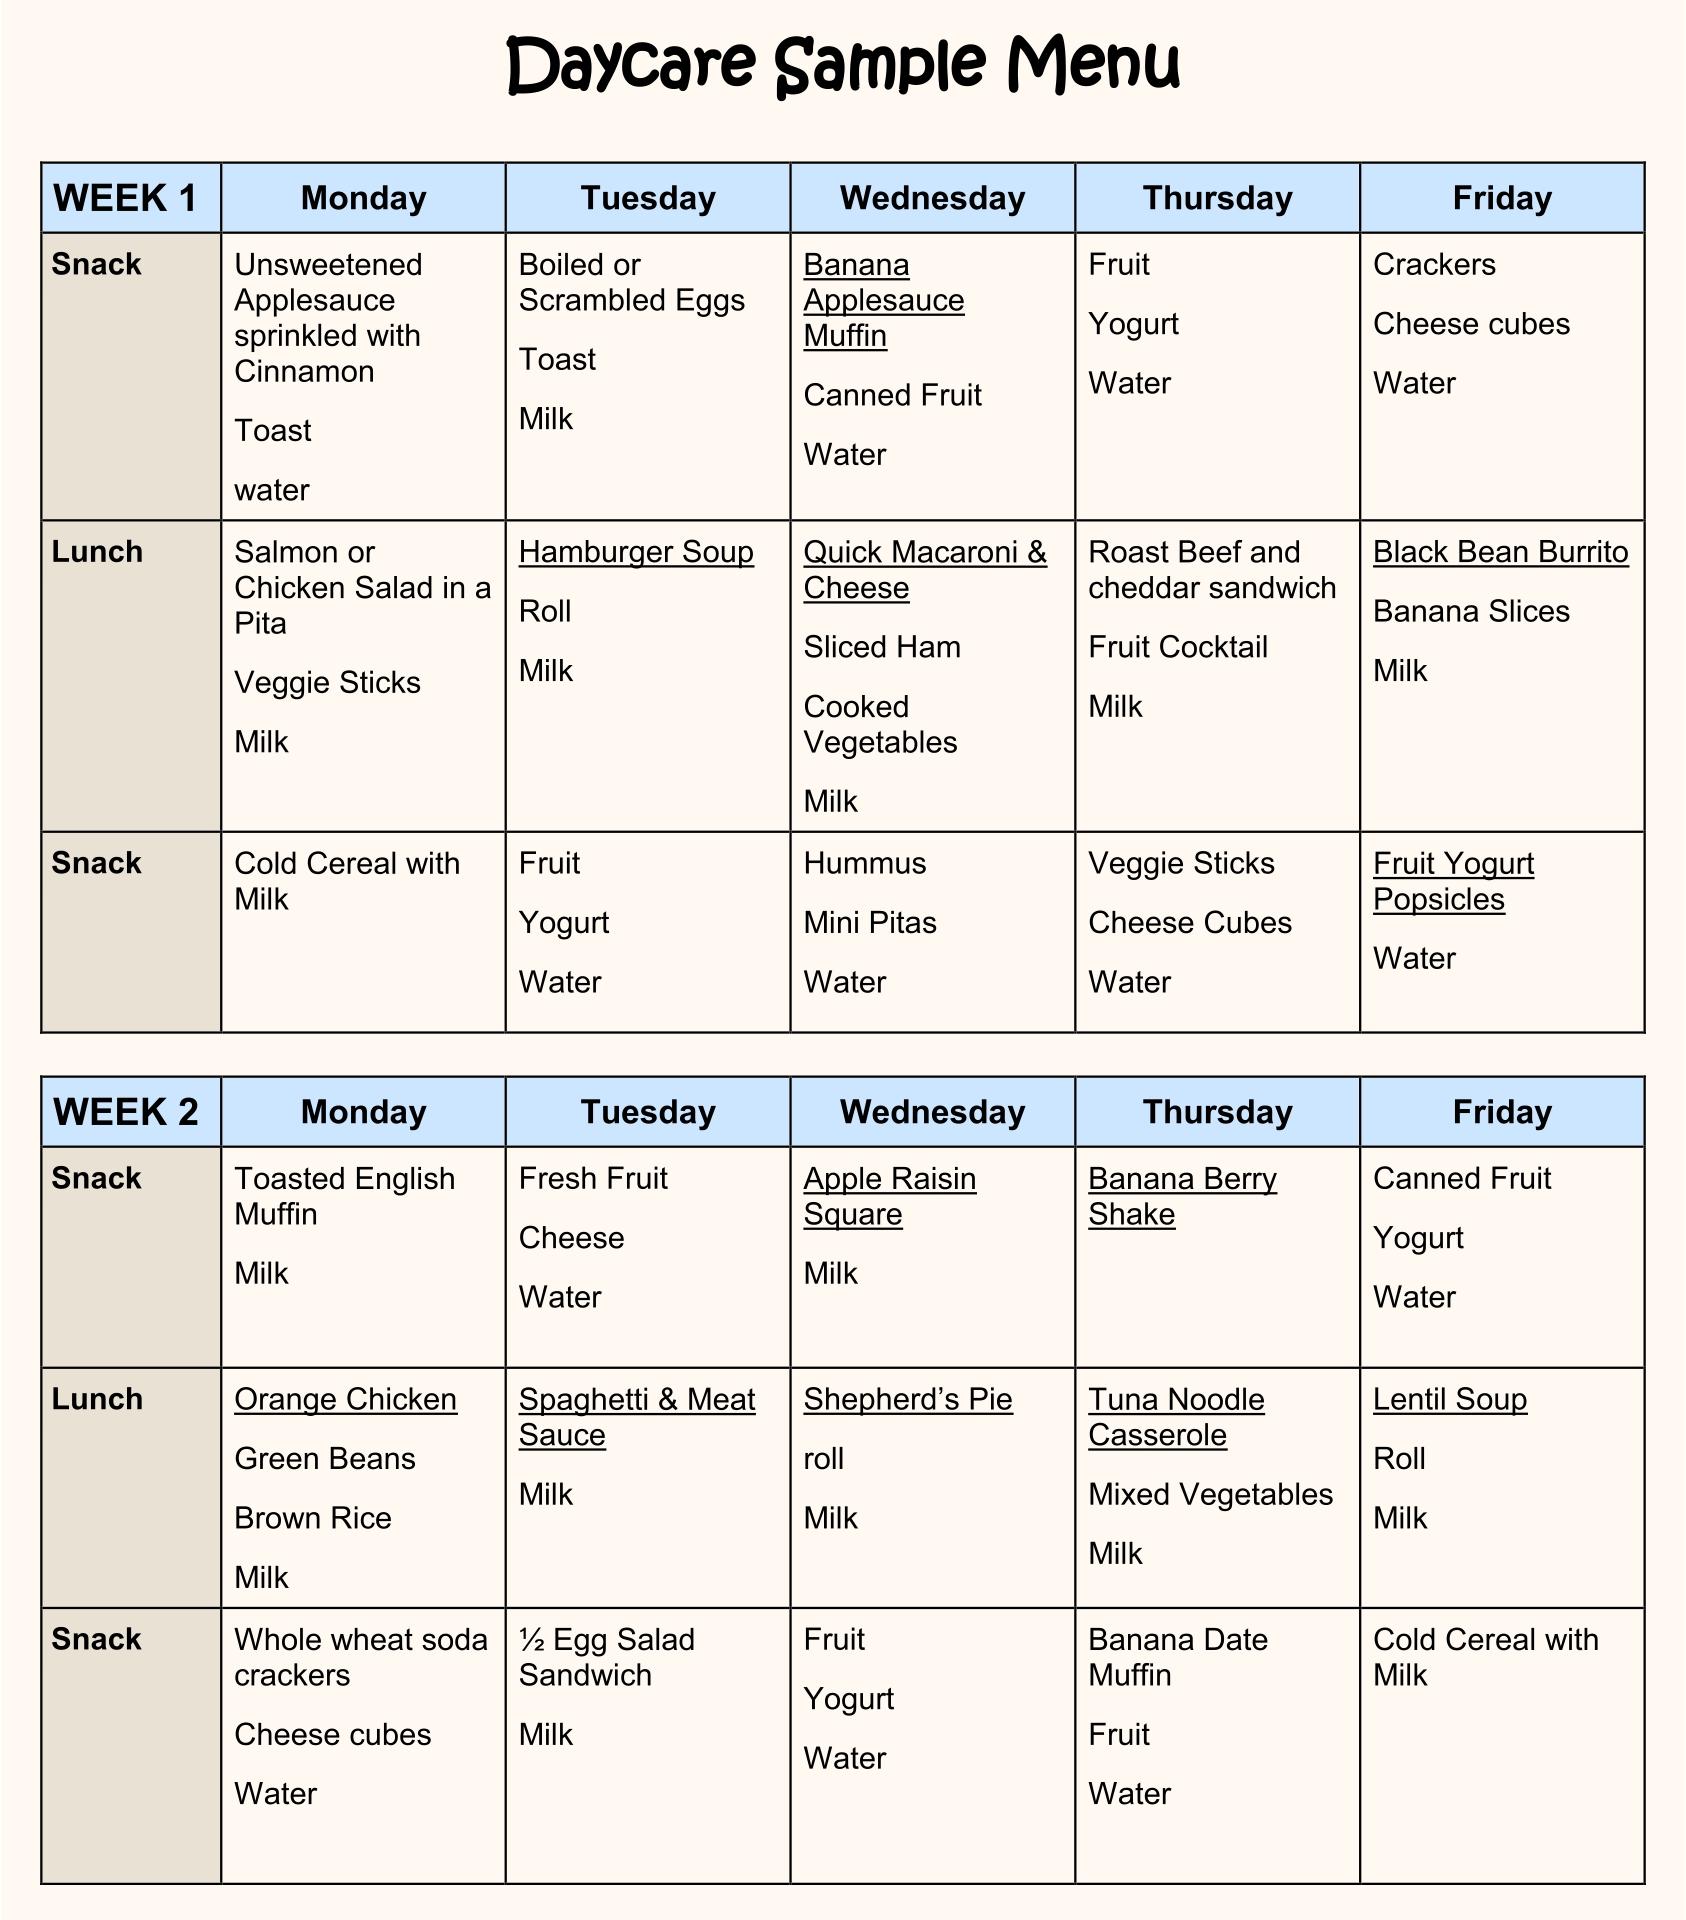 6 best images of printable sample day care menu food discharge planning in nursing homes house design ideas